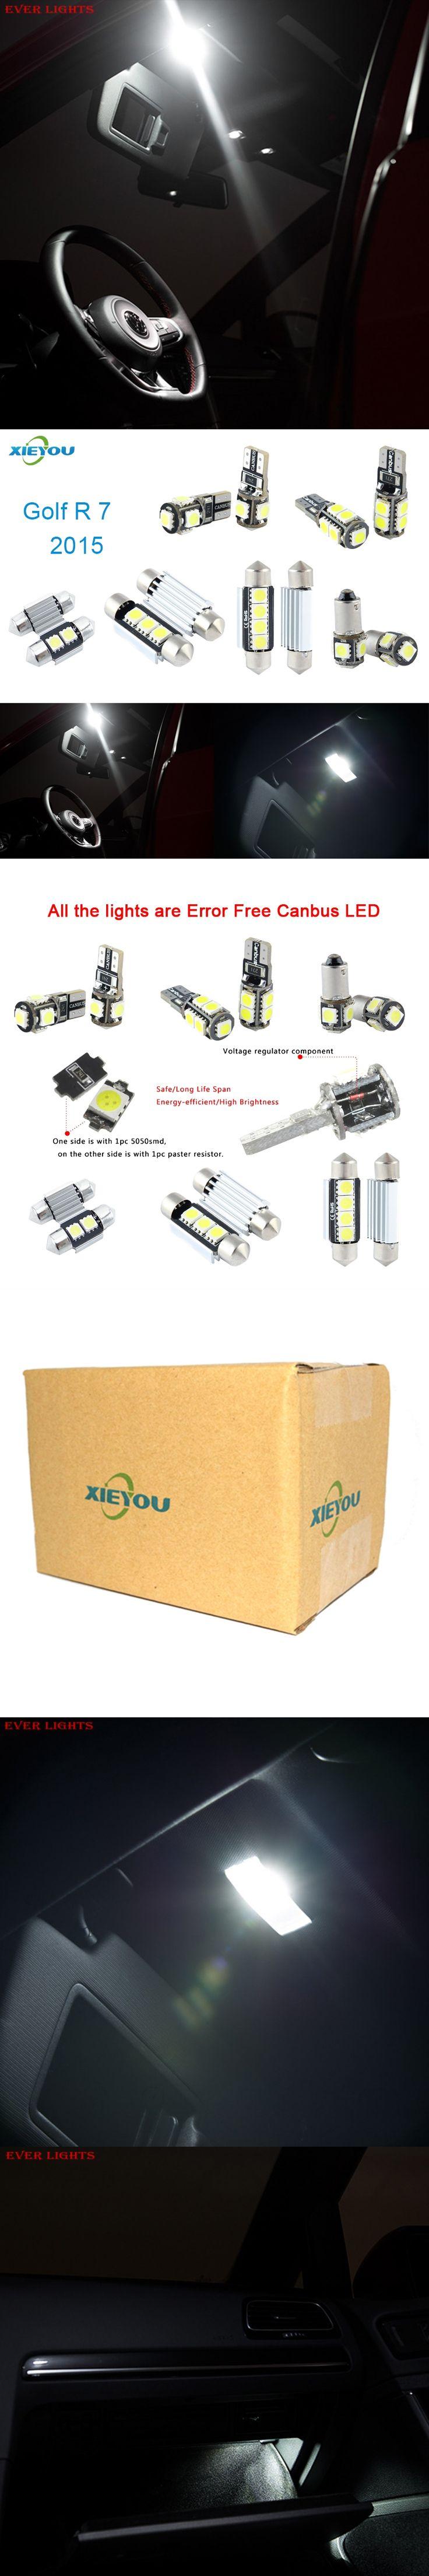 9pcs LED Canbus Interior Lights Kit Package For Volkswagen VW Golf VII R (2015+)